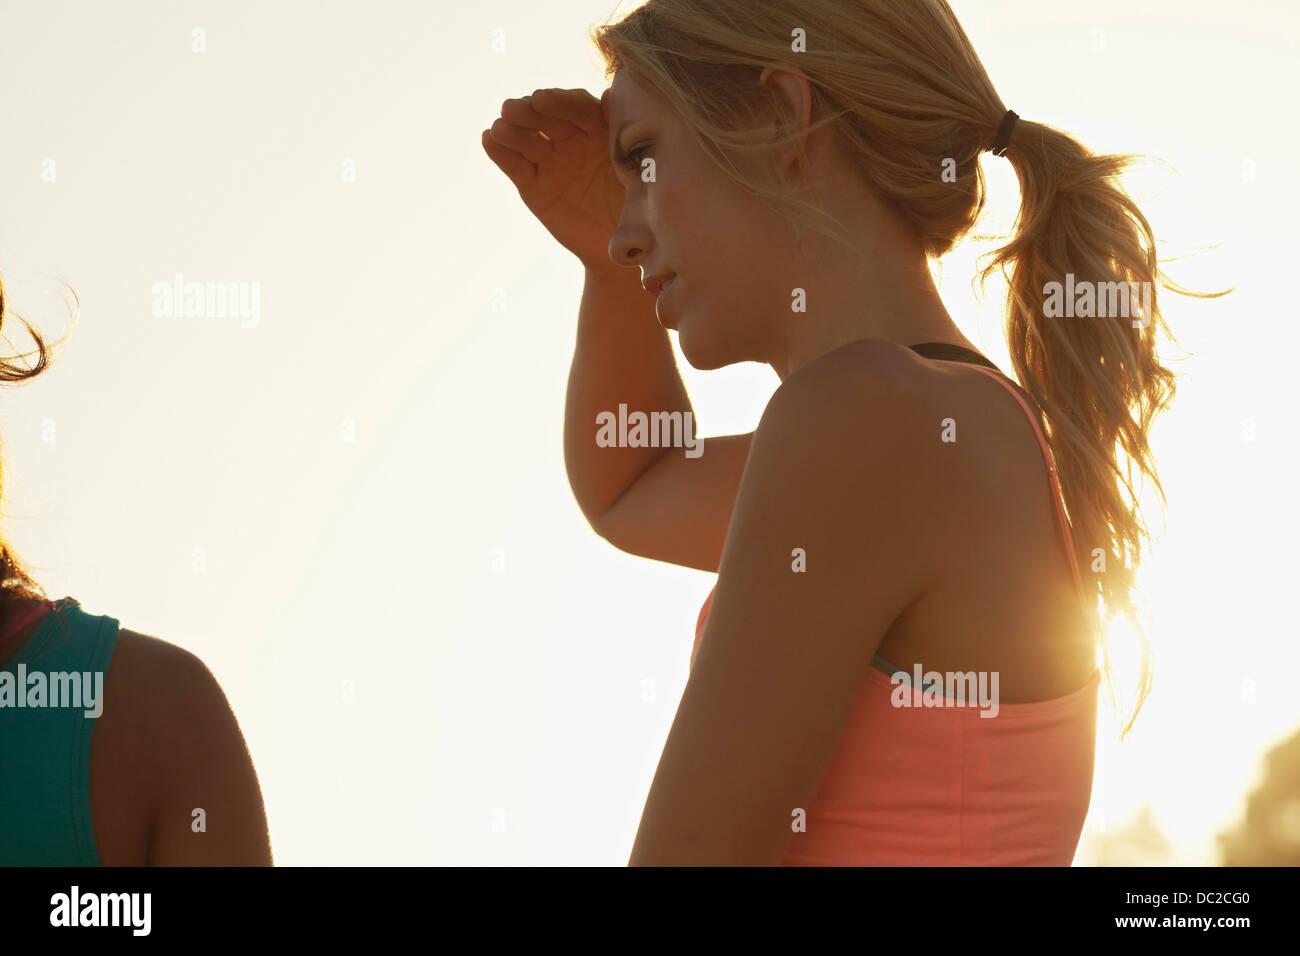 Frau blockierende Sonne mit hand Stockbild